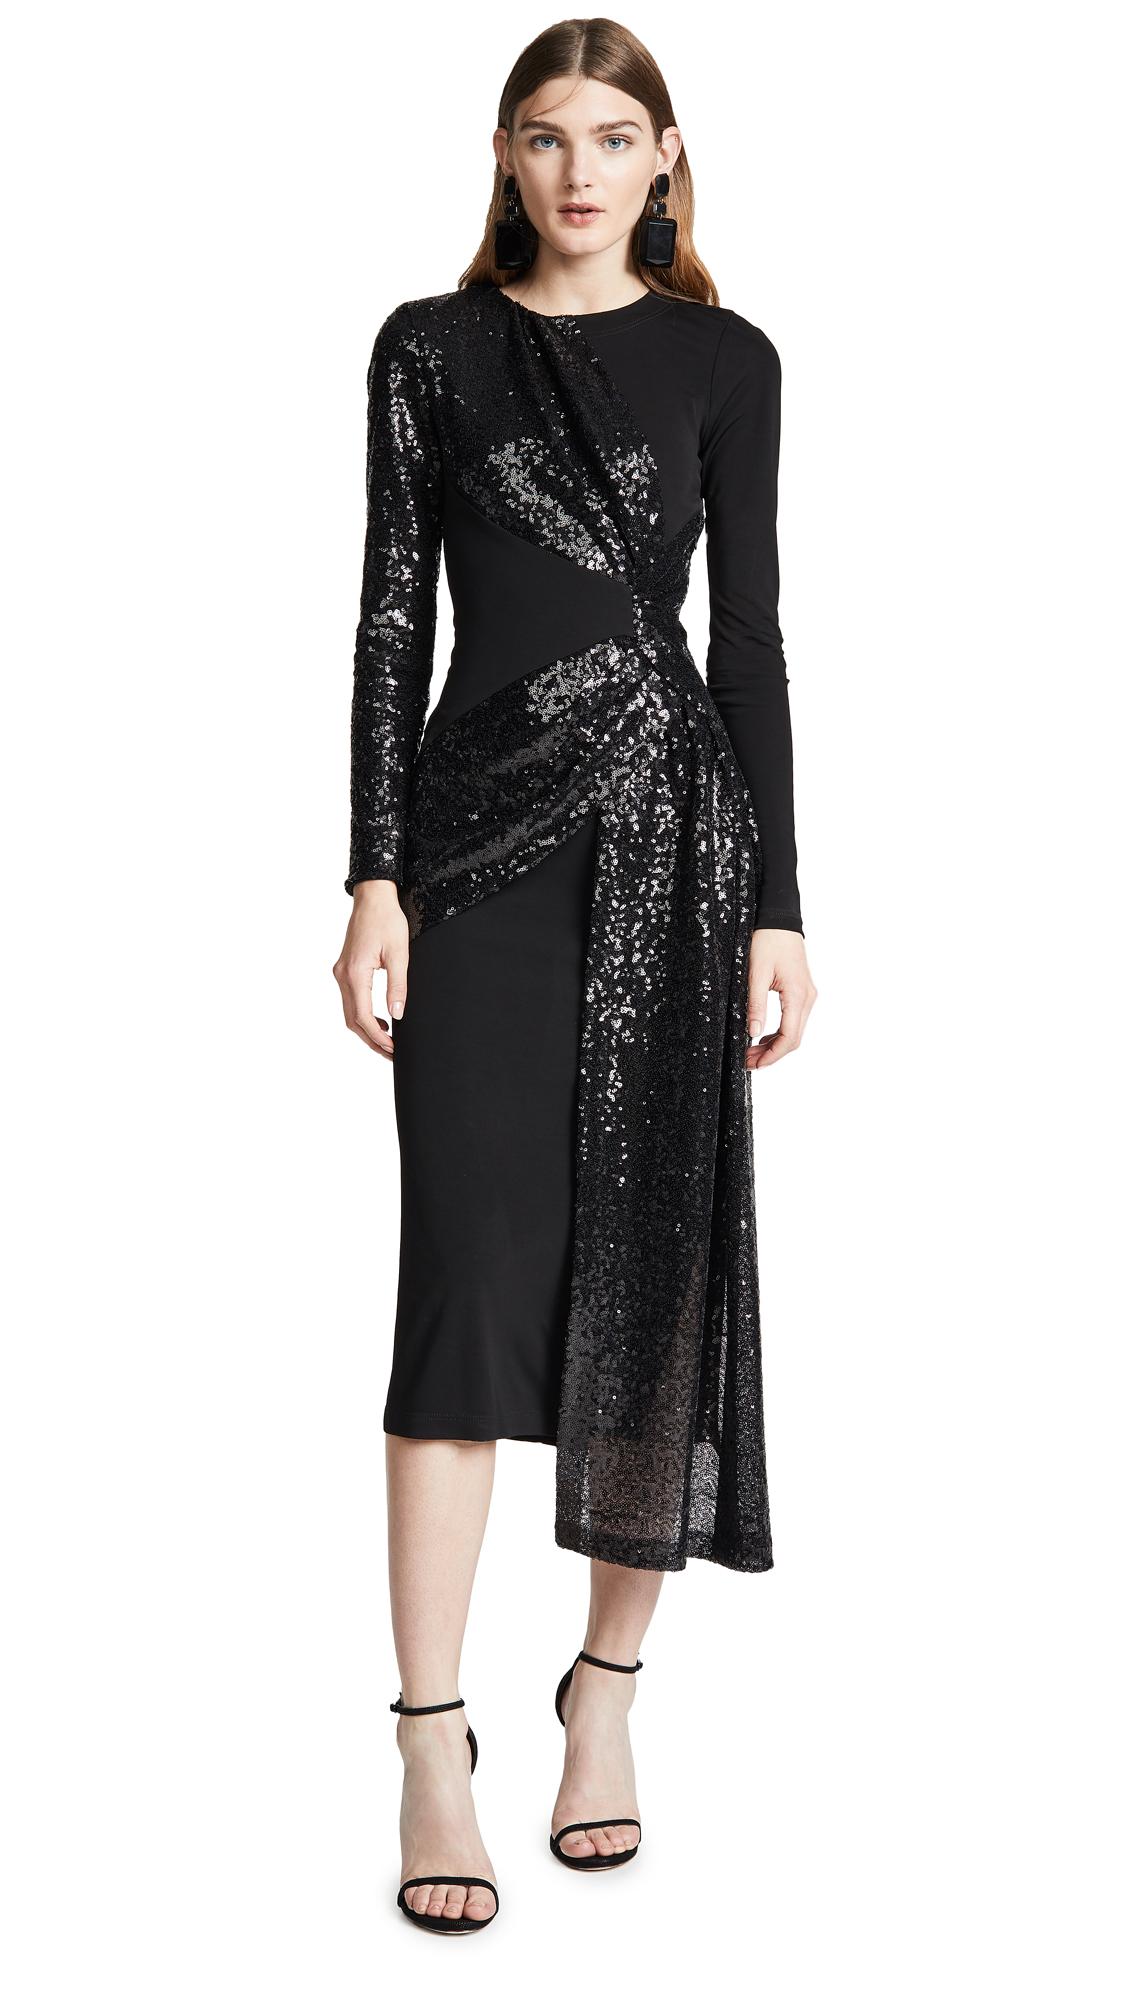 Prabal Gurung Shilu Twist Front Dress In Black/Black